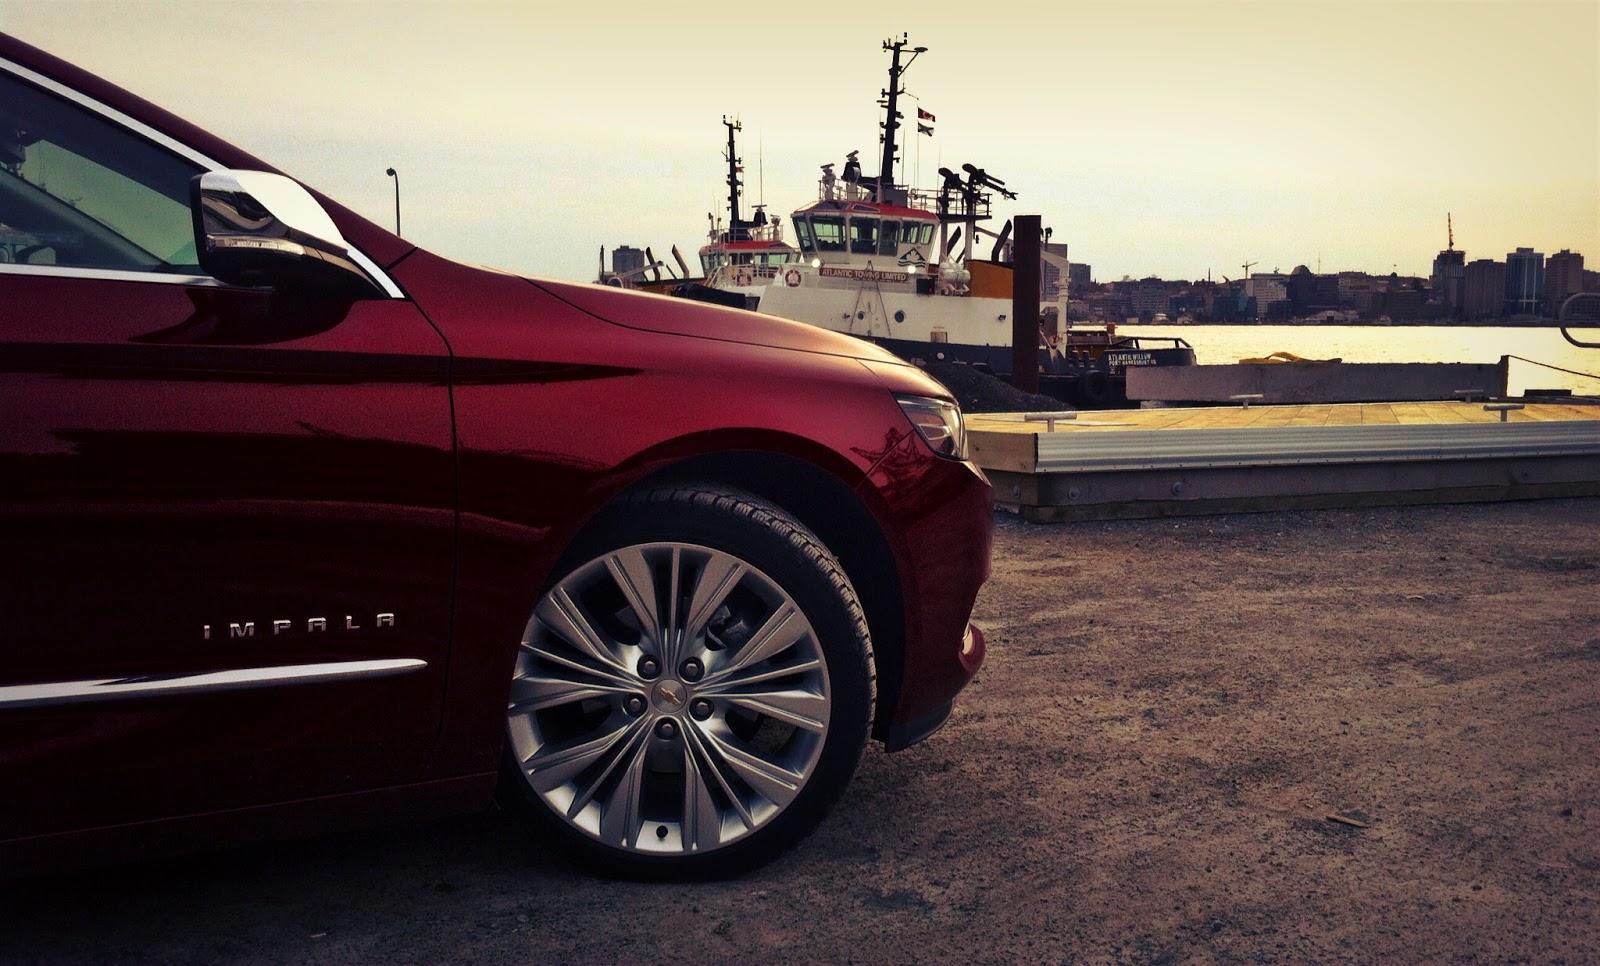 2014 Chevrolet Impala 20-inch wheel